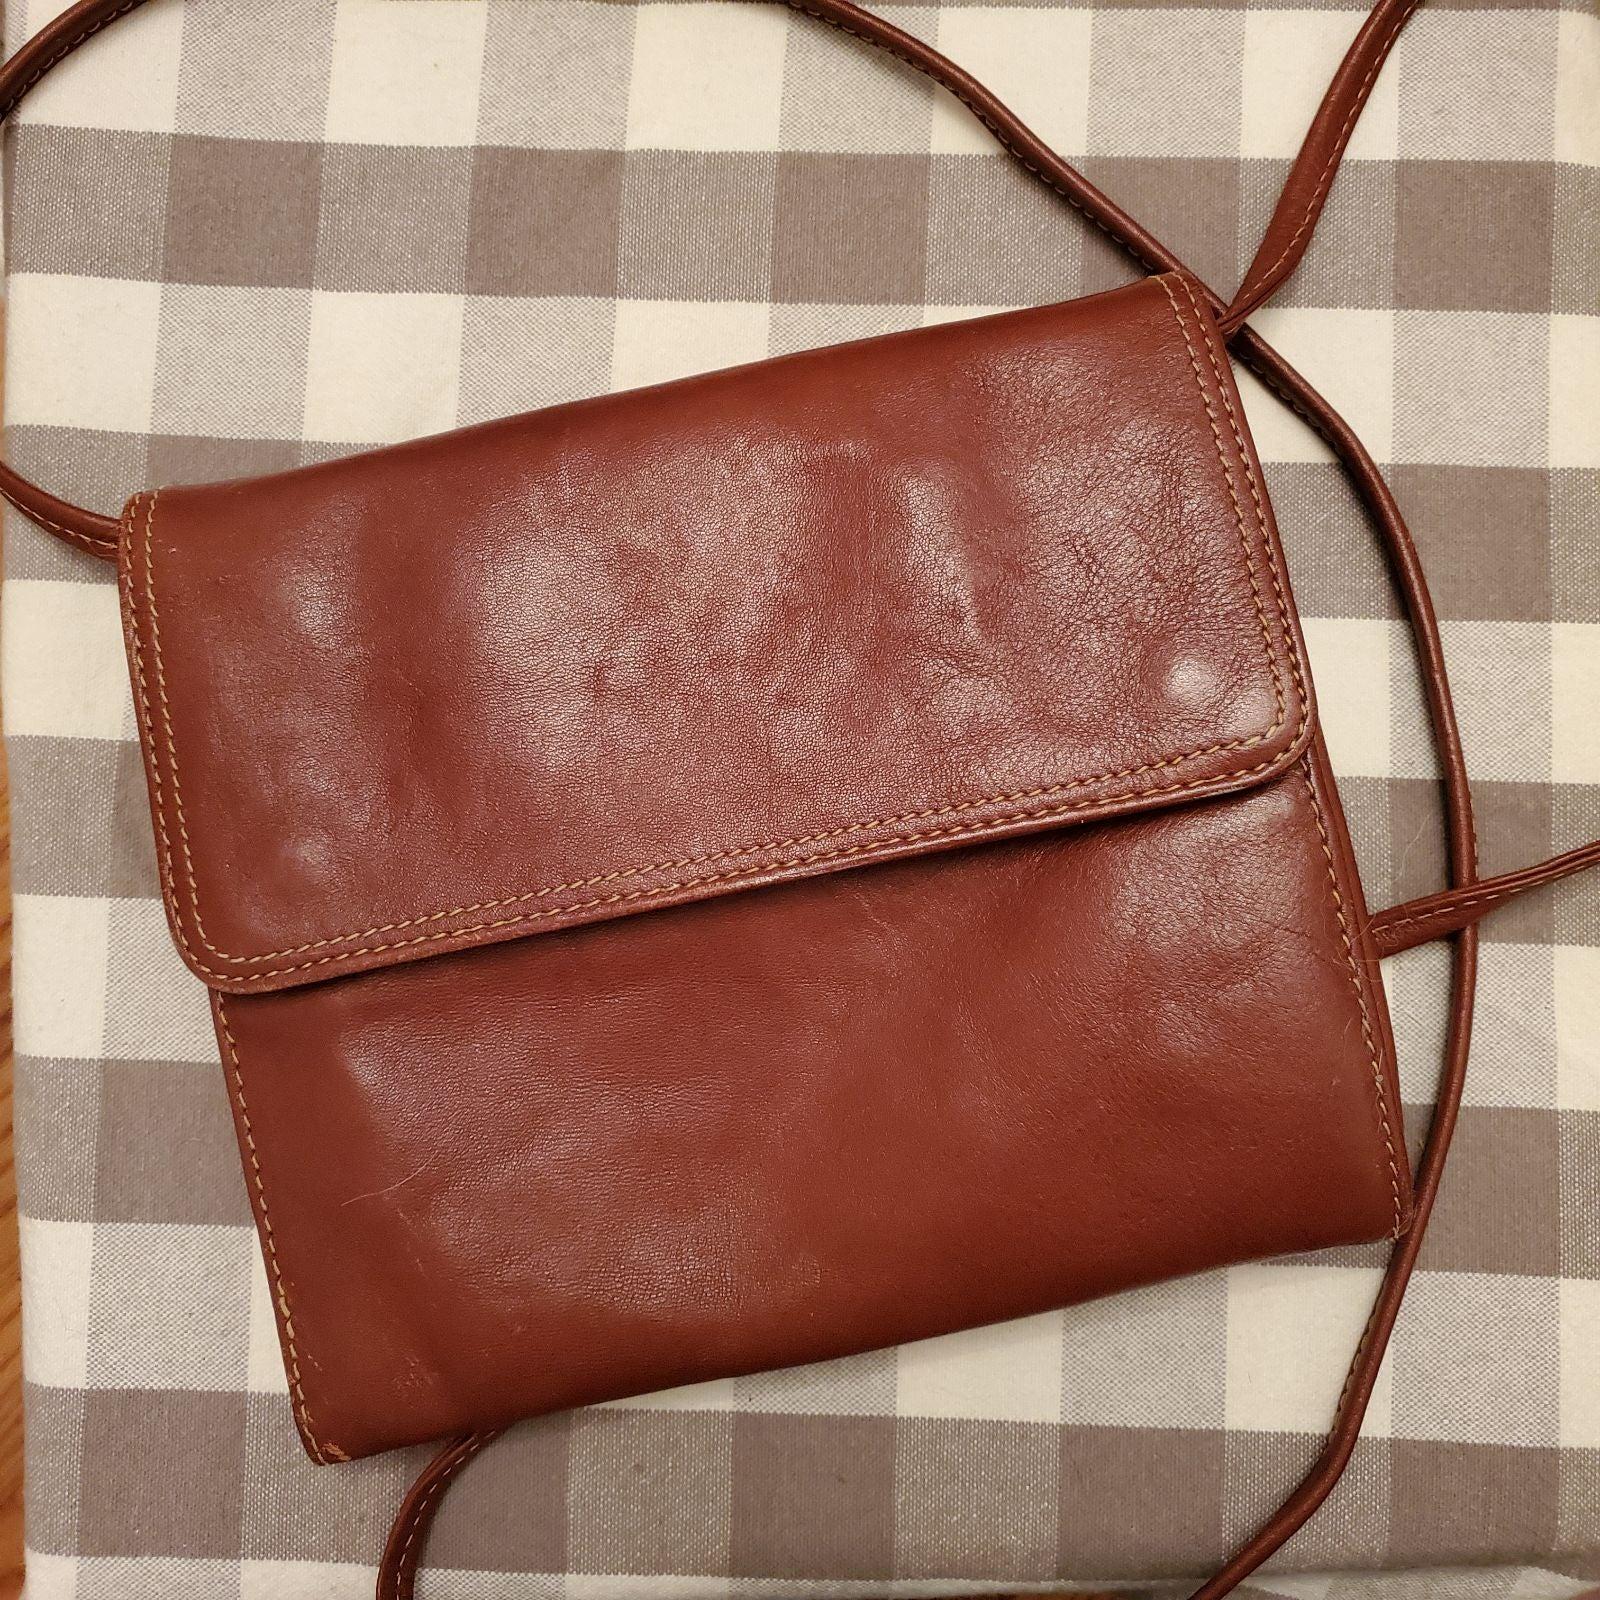 Vintage Italian Leather Crossbody Purse